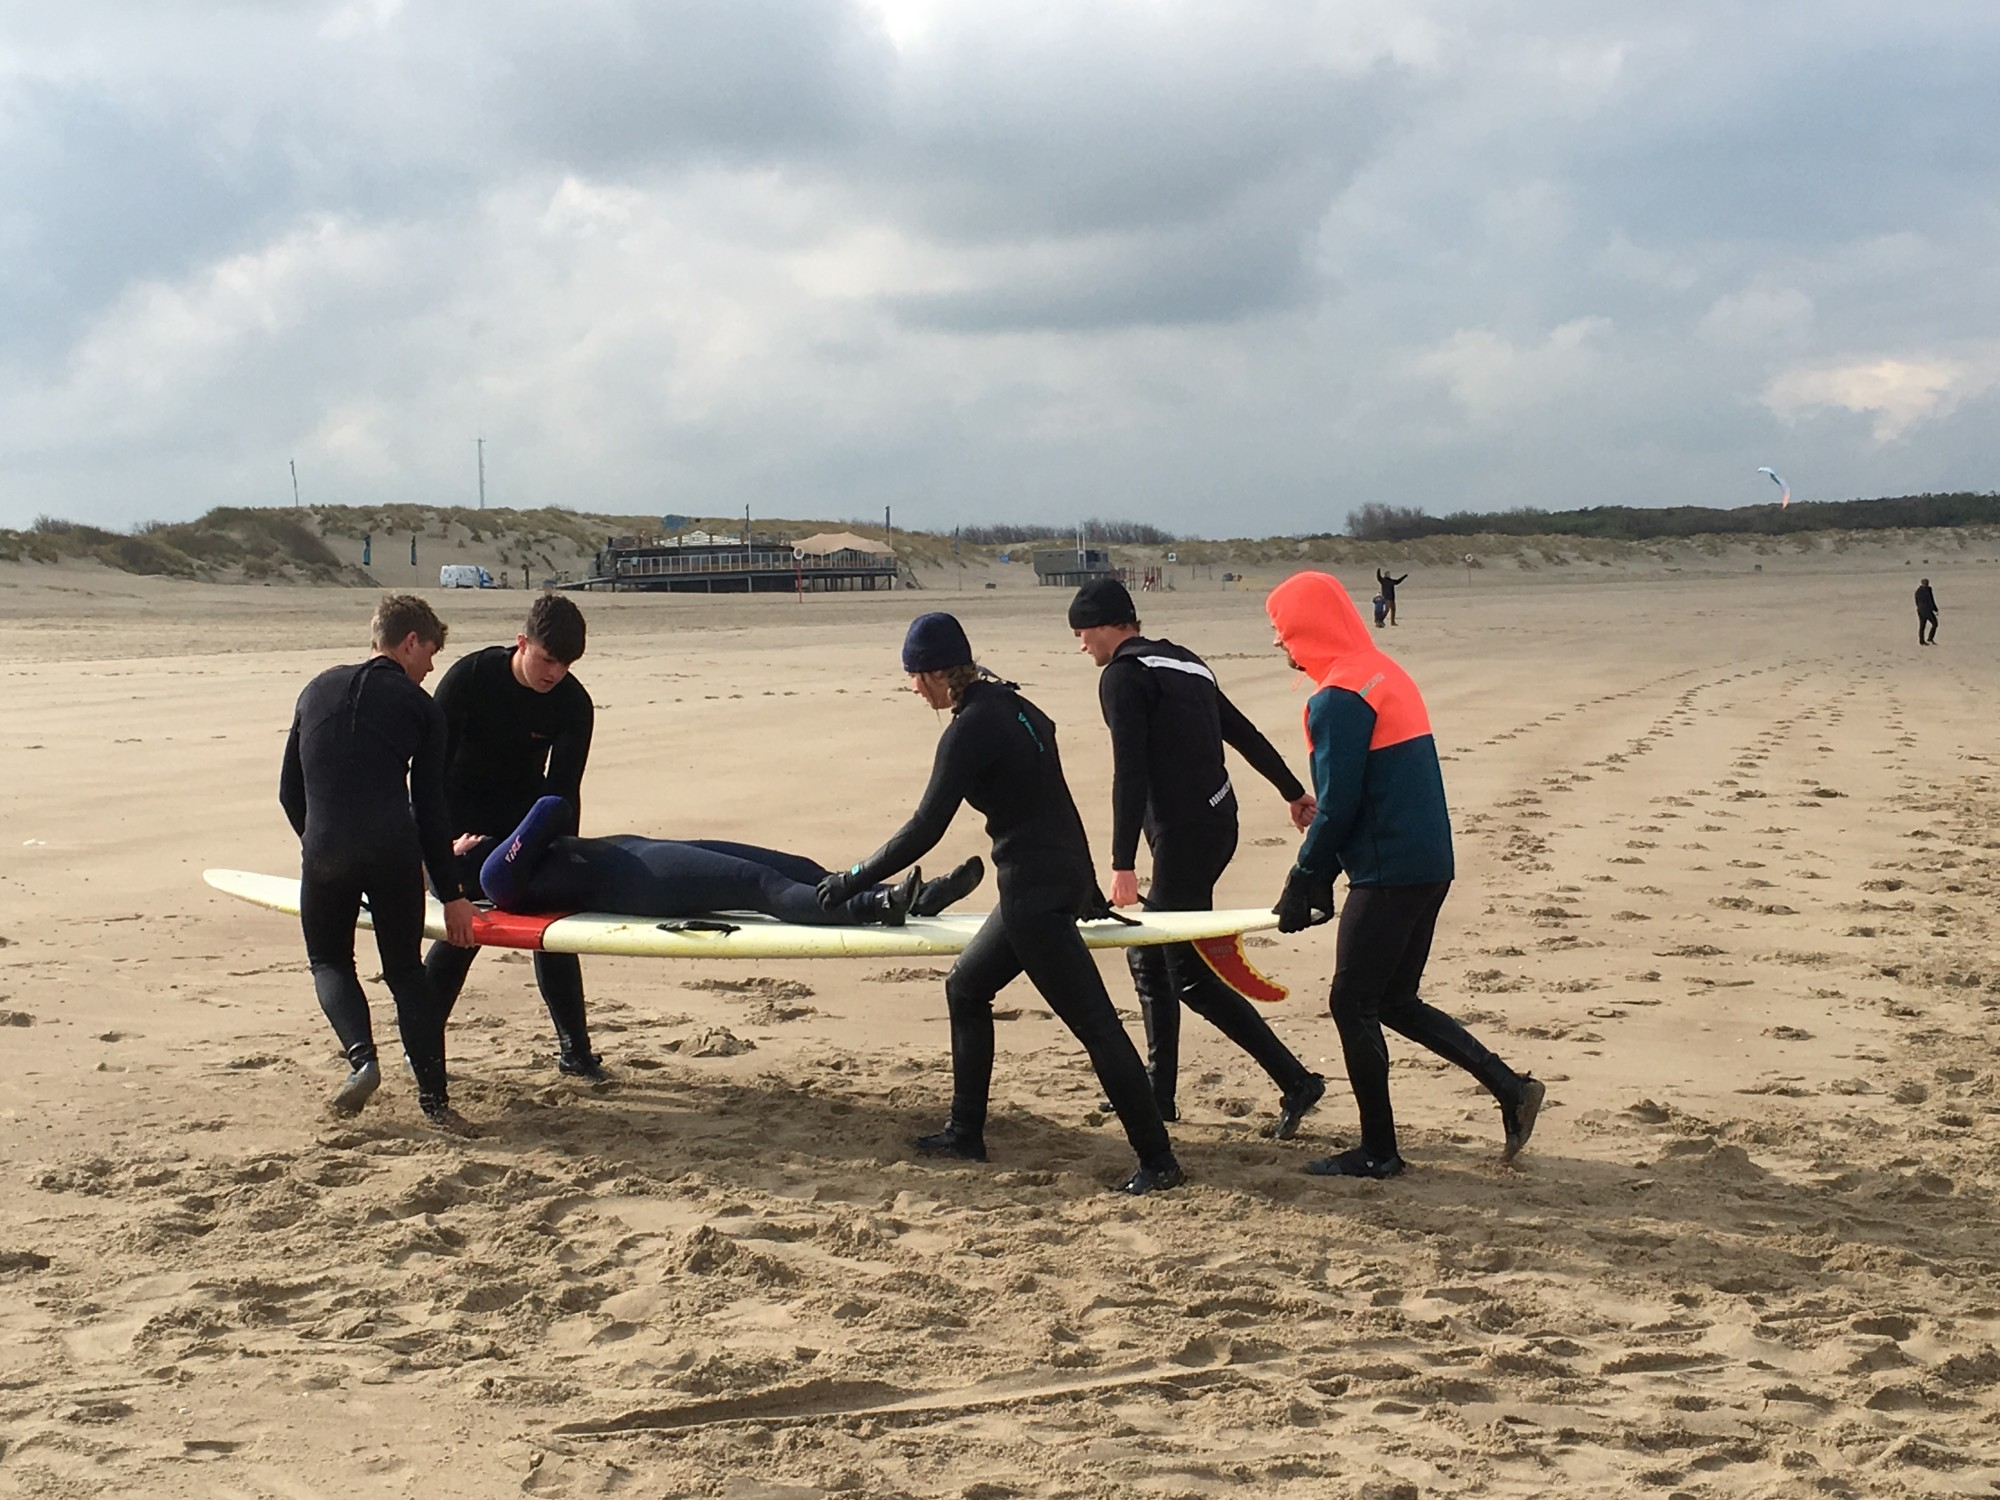 mbo4leisuresports-strand-surfboard-oefenen